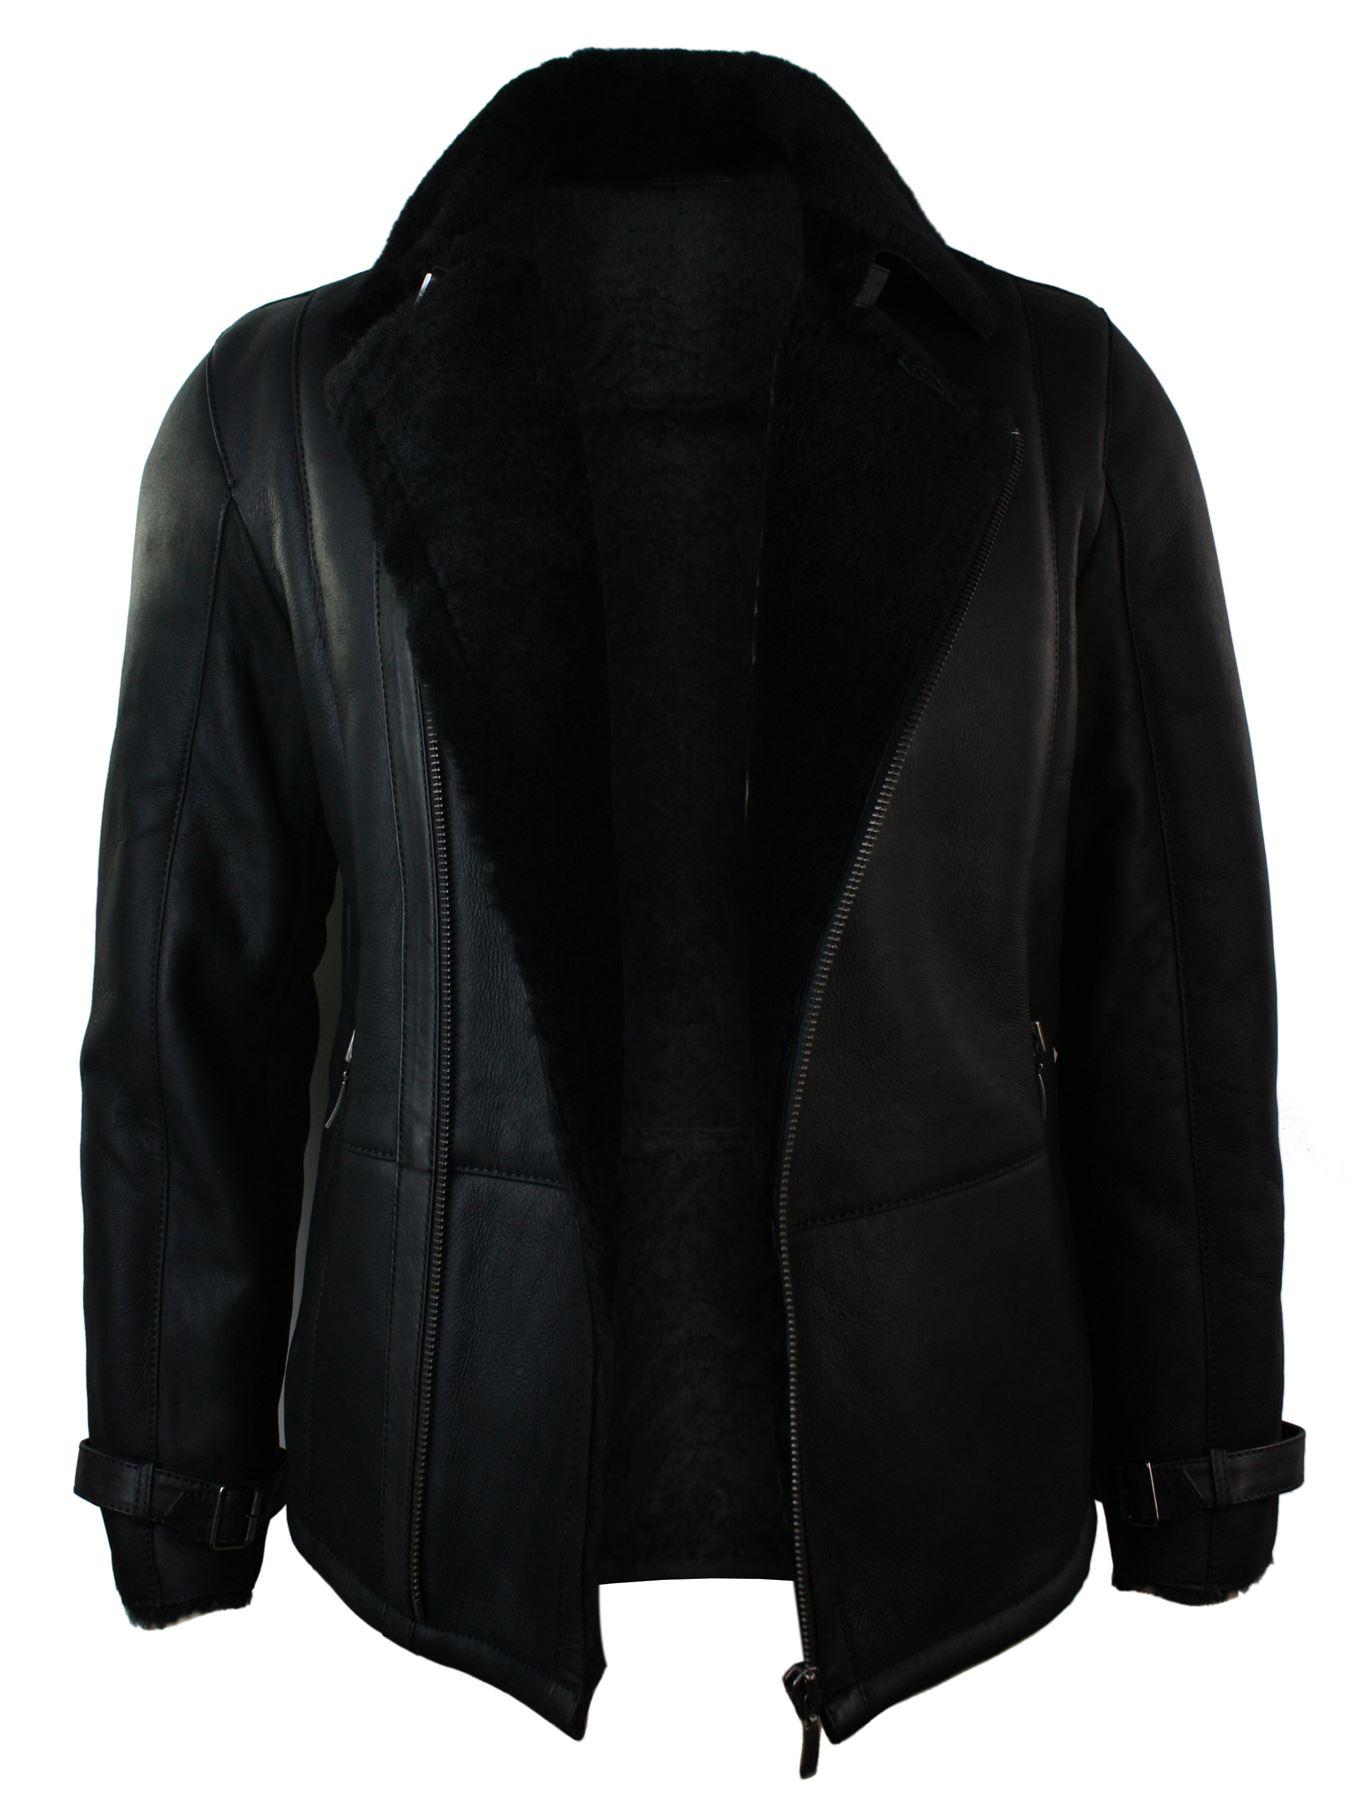 manteau cuir hommes cuir v ritable noir col en fourrure ebay. Black Bedroom Furniture Sets. Home Design Ideas